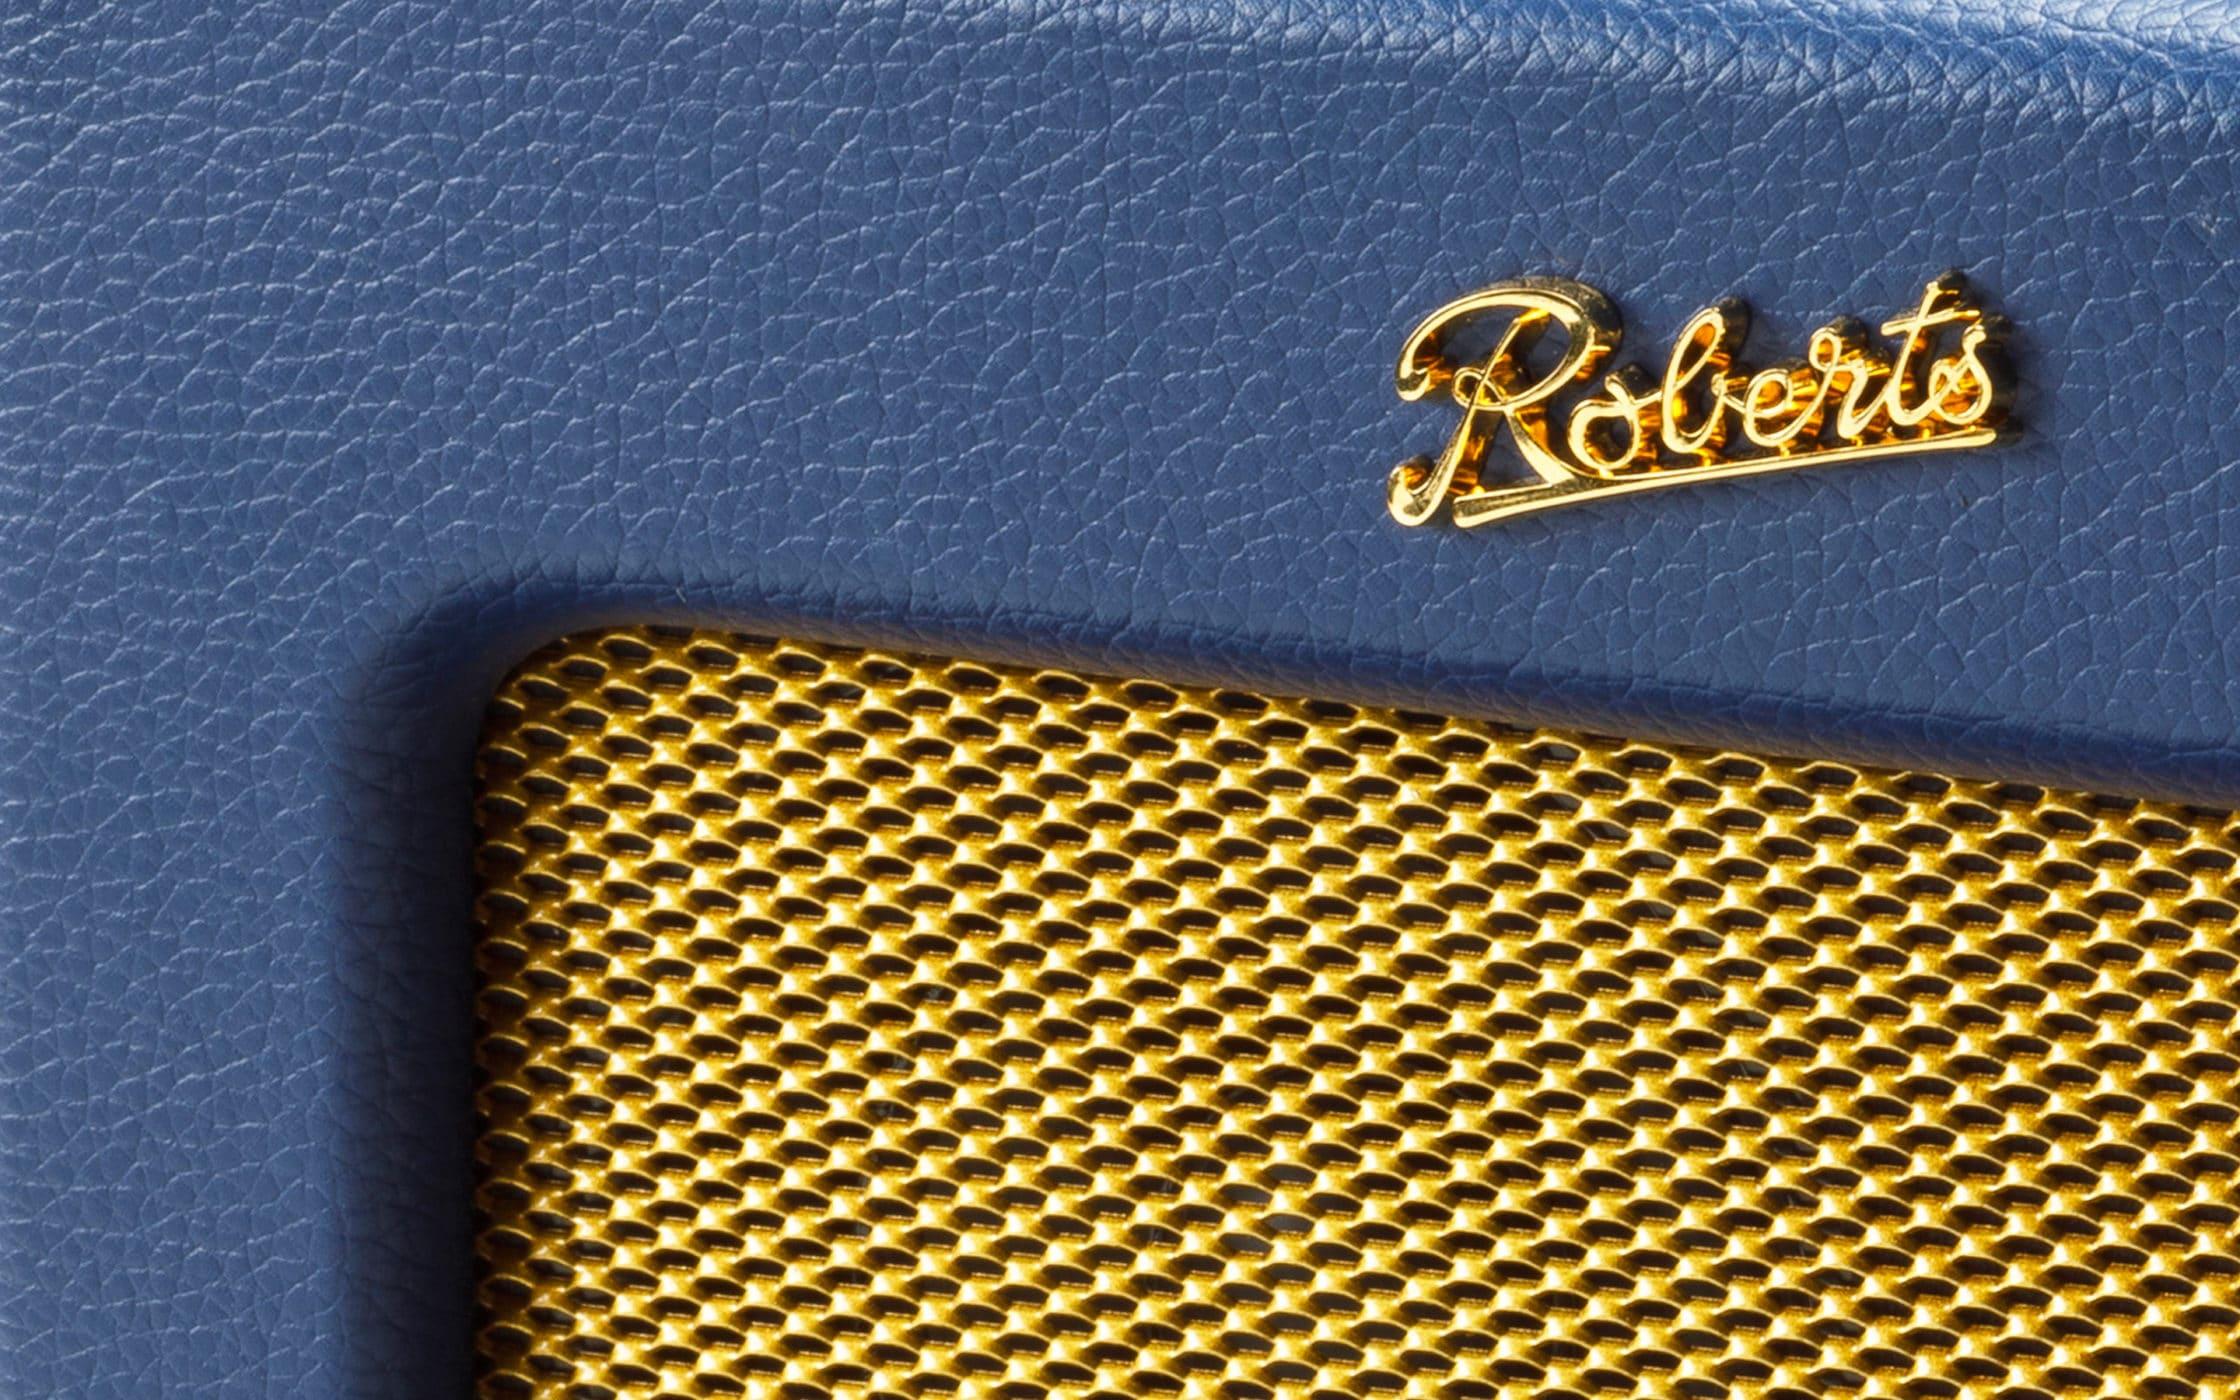 Roberts Shop header